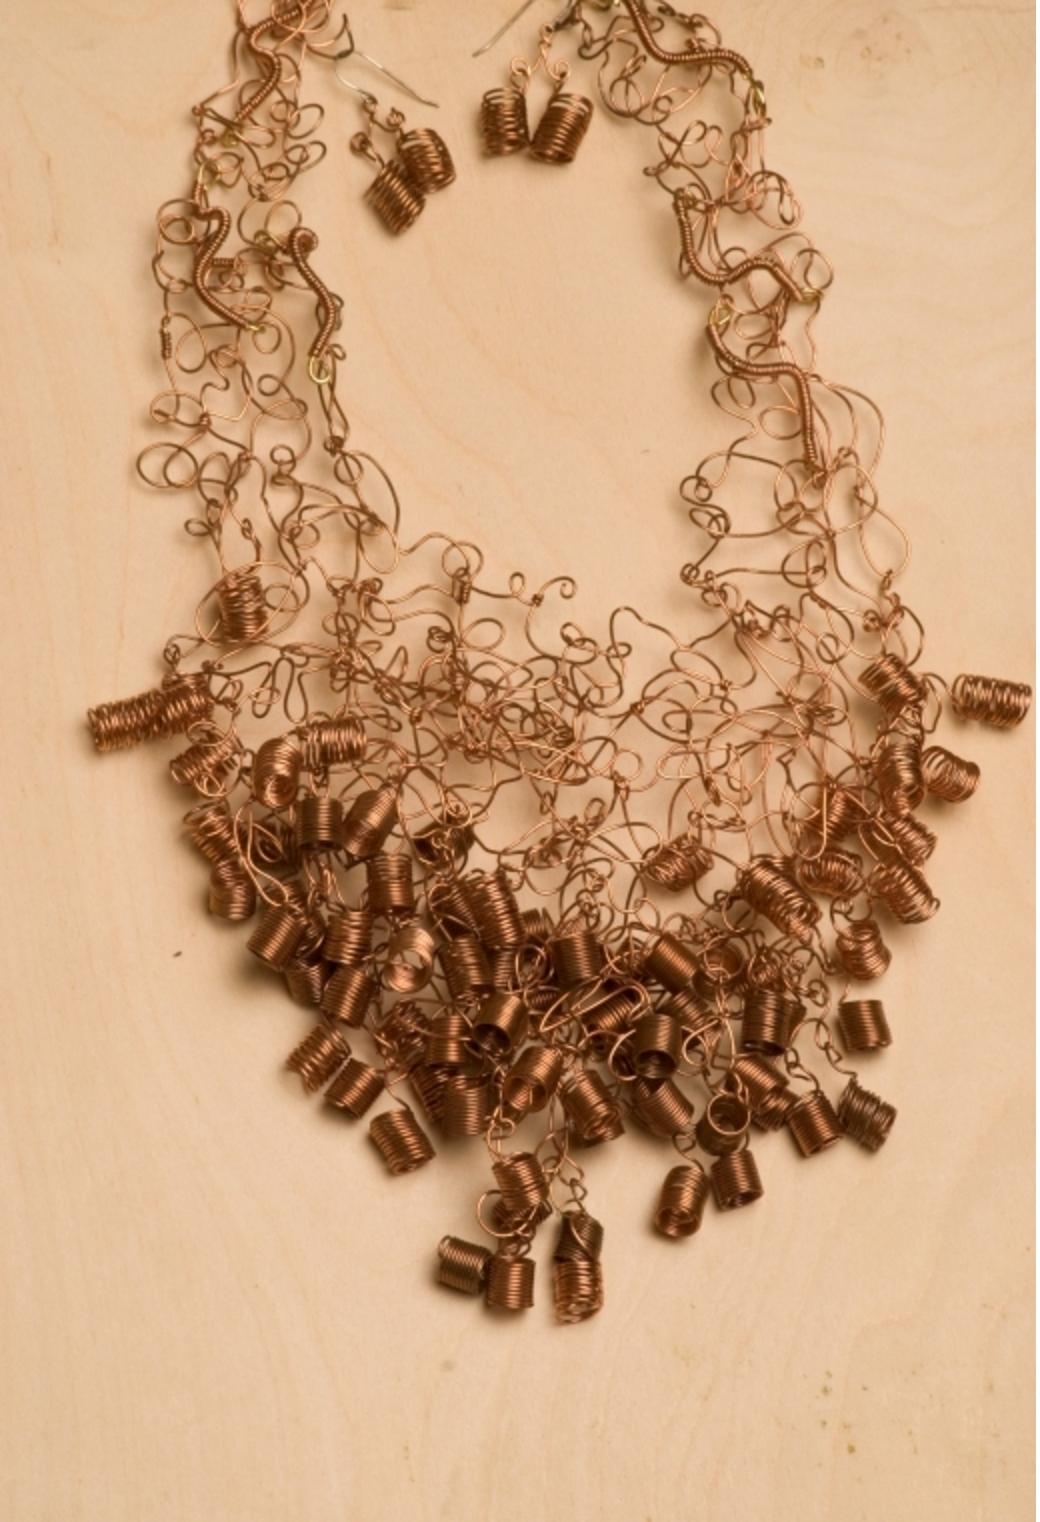 Queens Necklace